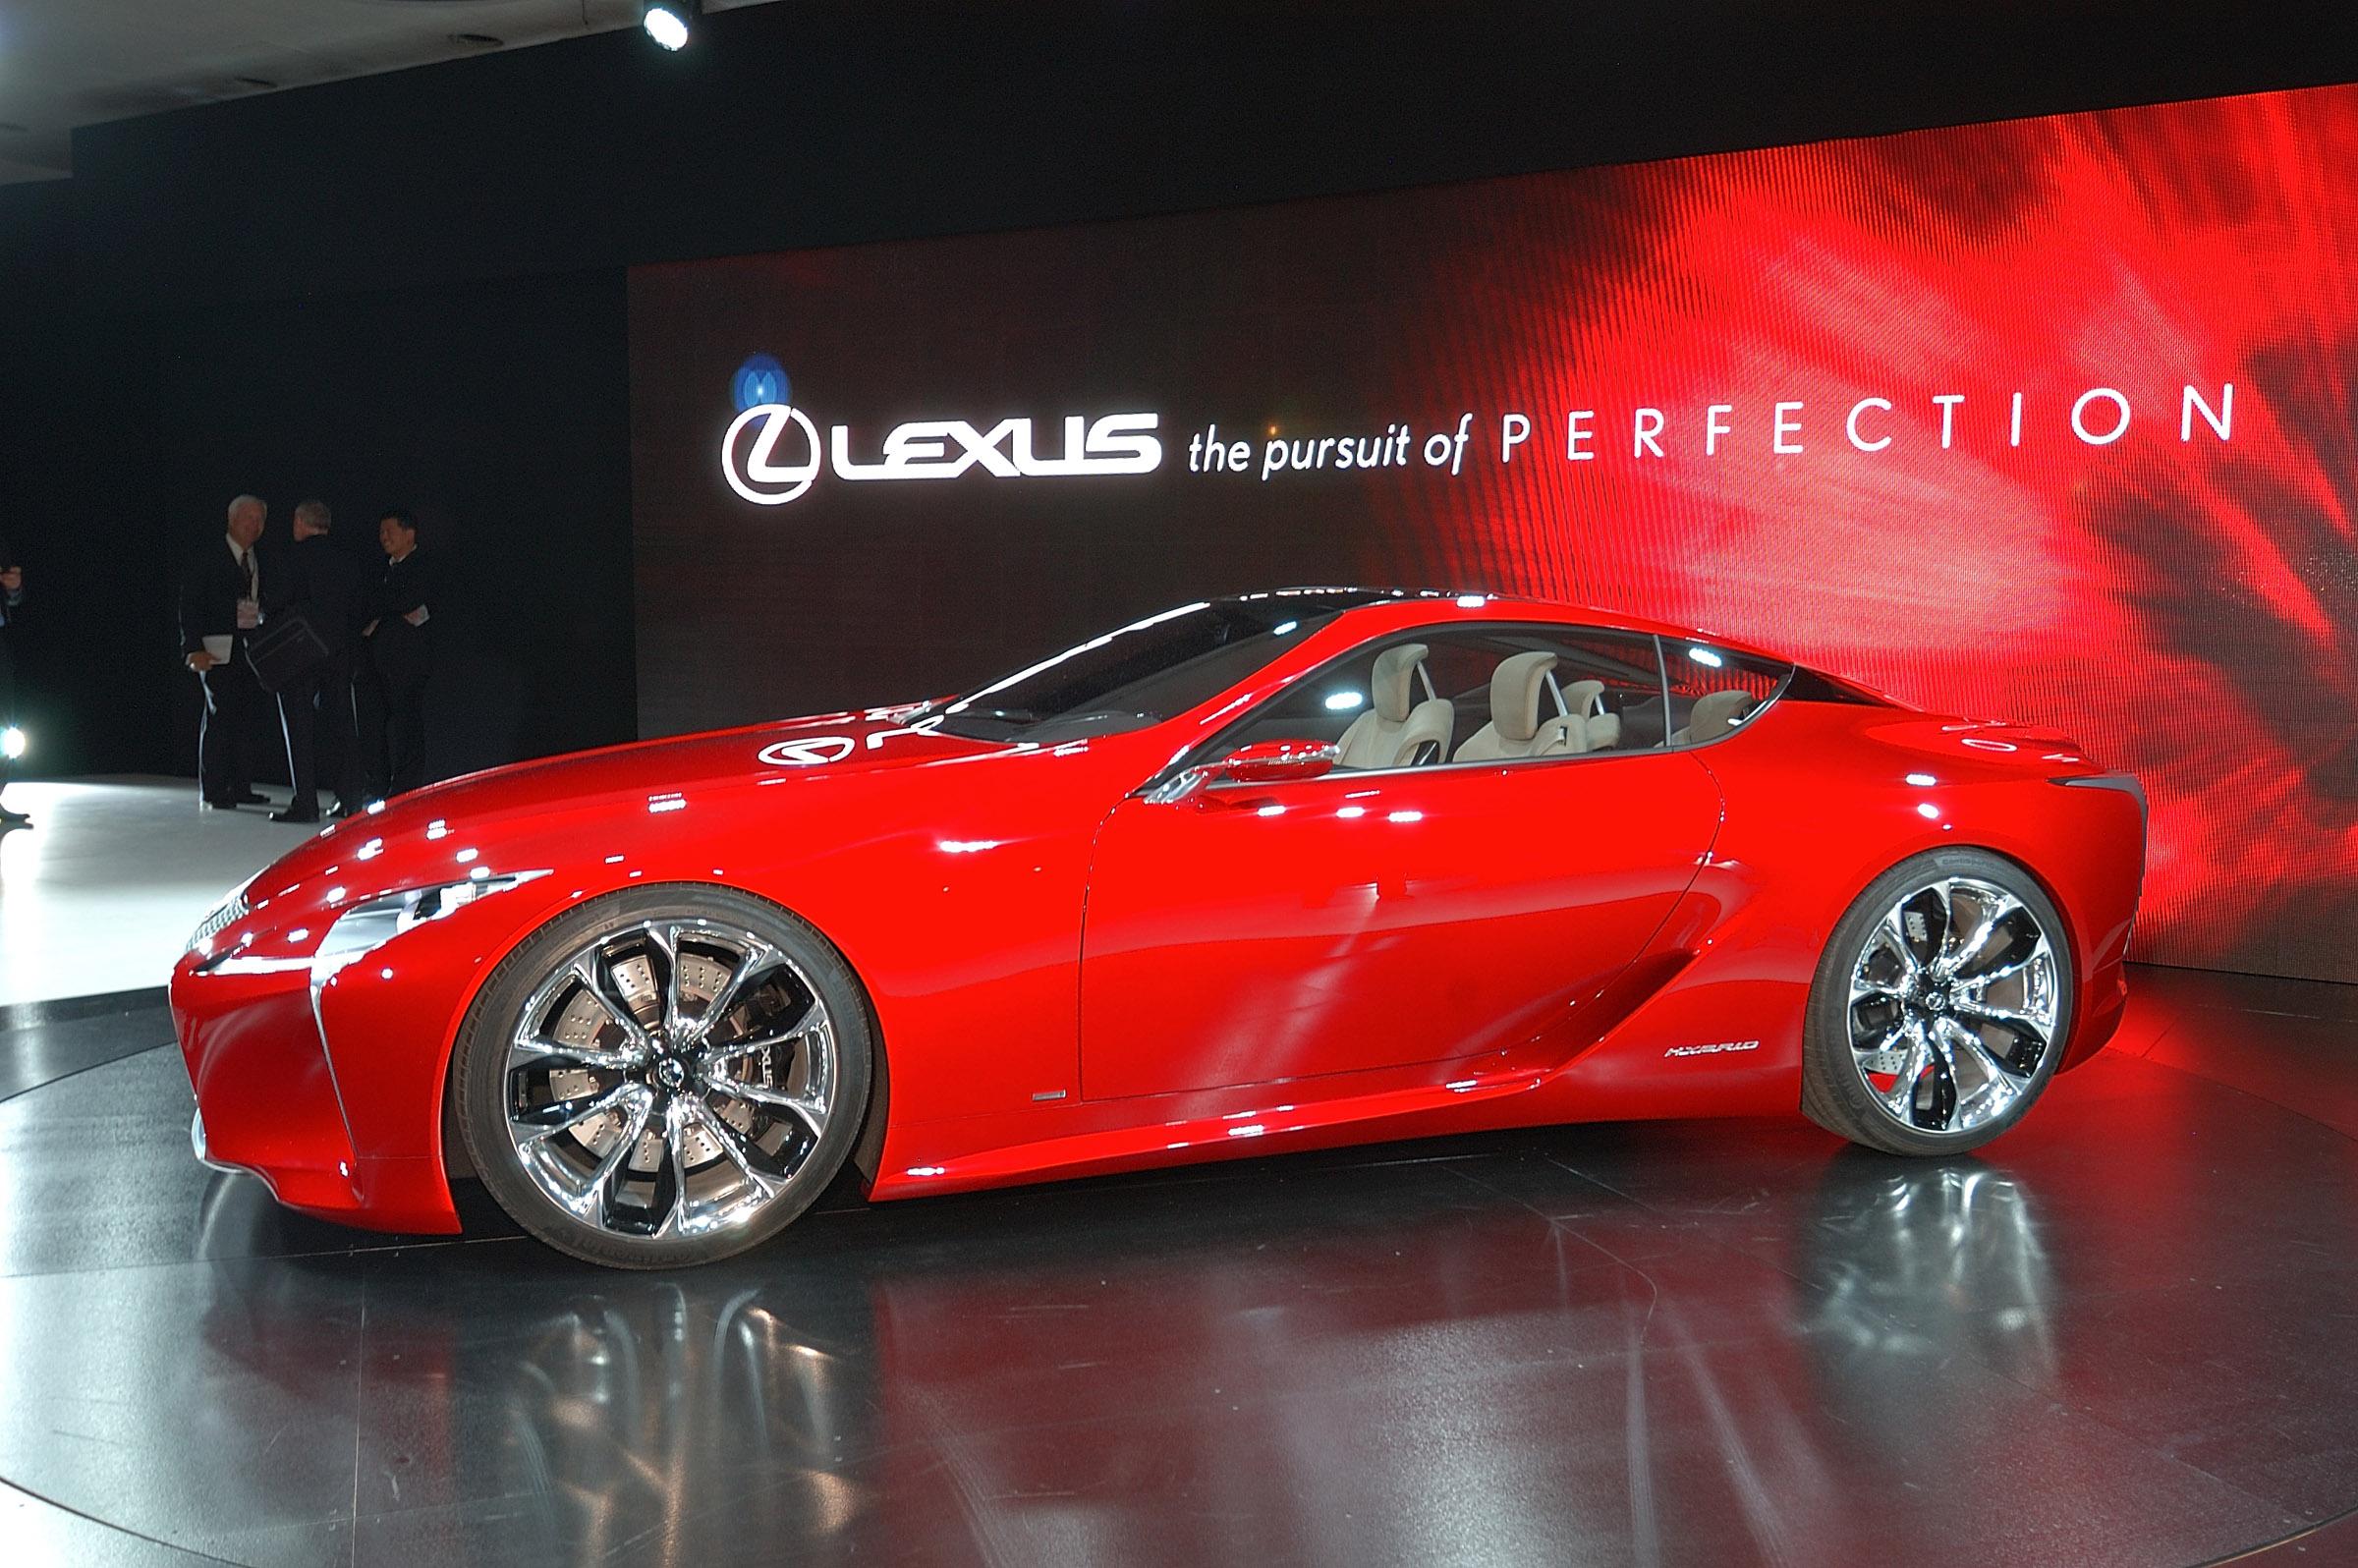 http://www.automobilesreview.com/img/2012-lexus-lf-lc-concept-detroit-2012/2012-lexus-lf-lc-concept-detroit-2012-05.jpg